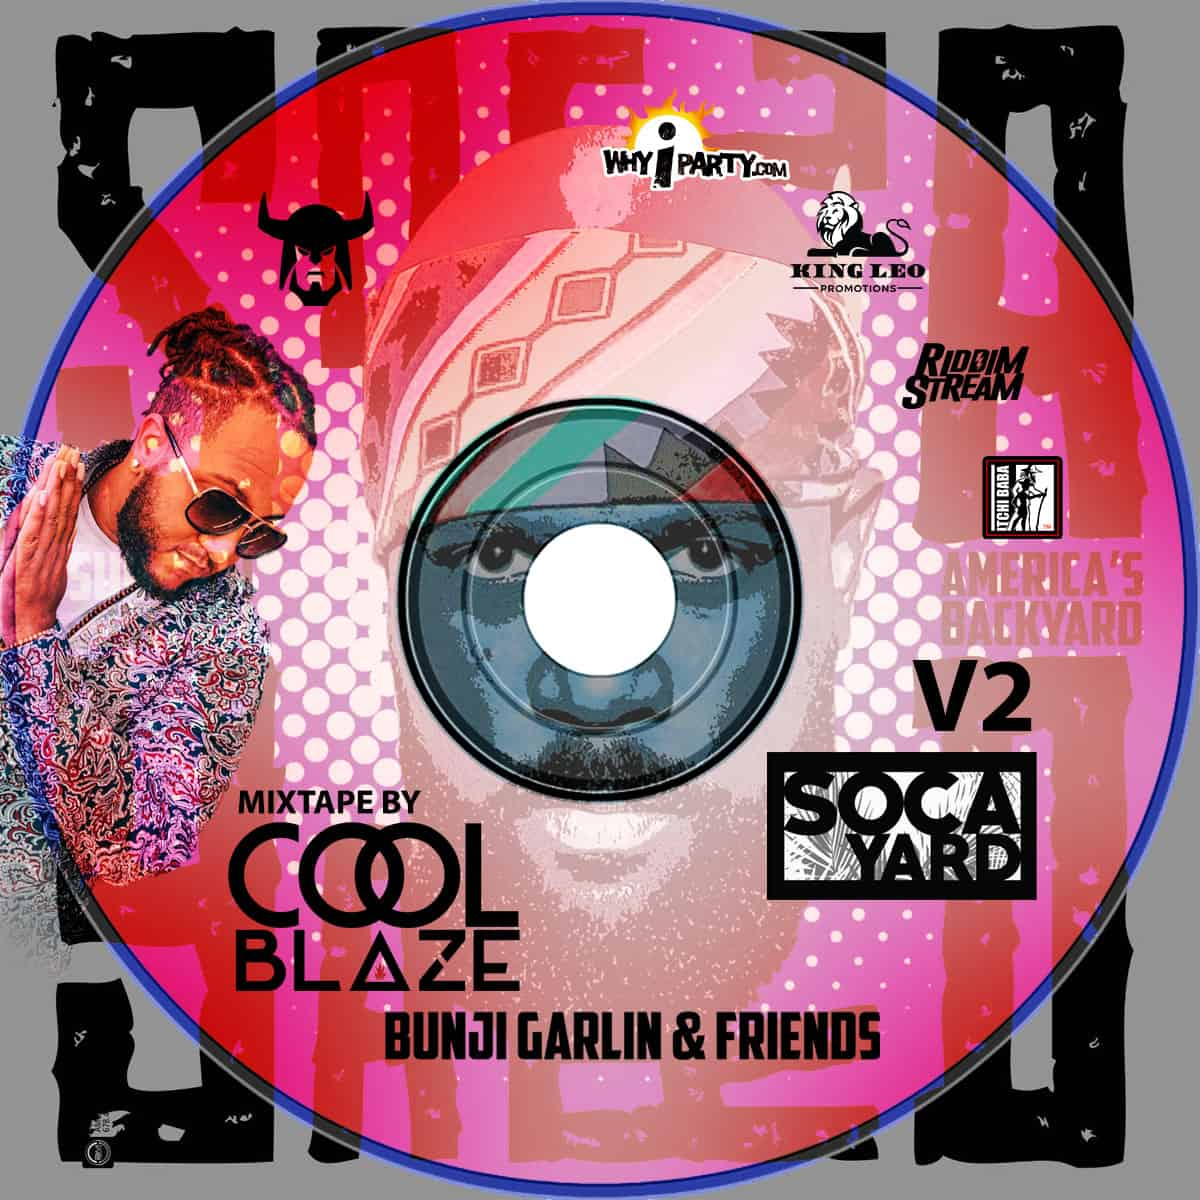 Soca Yard v2 mixtape by LL Cool Blaze